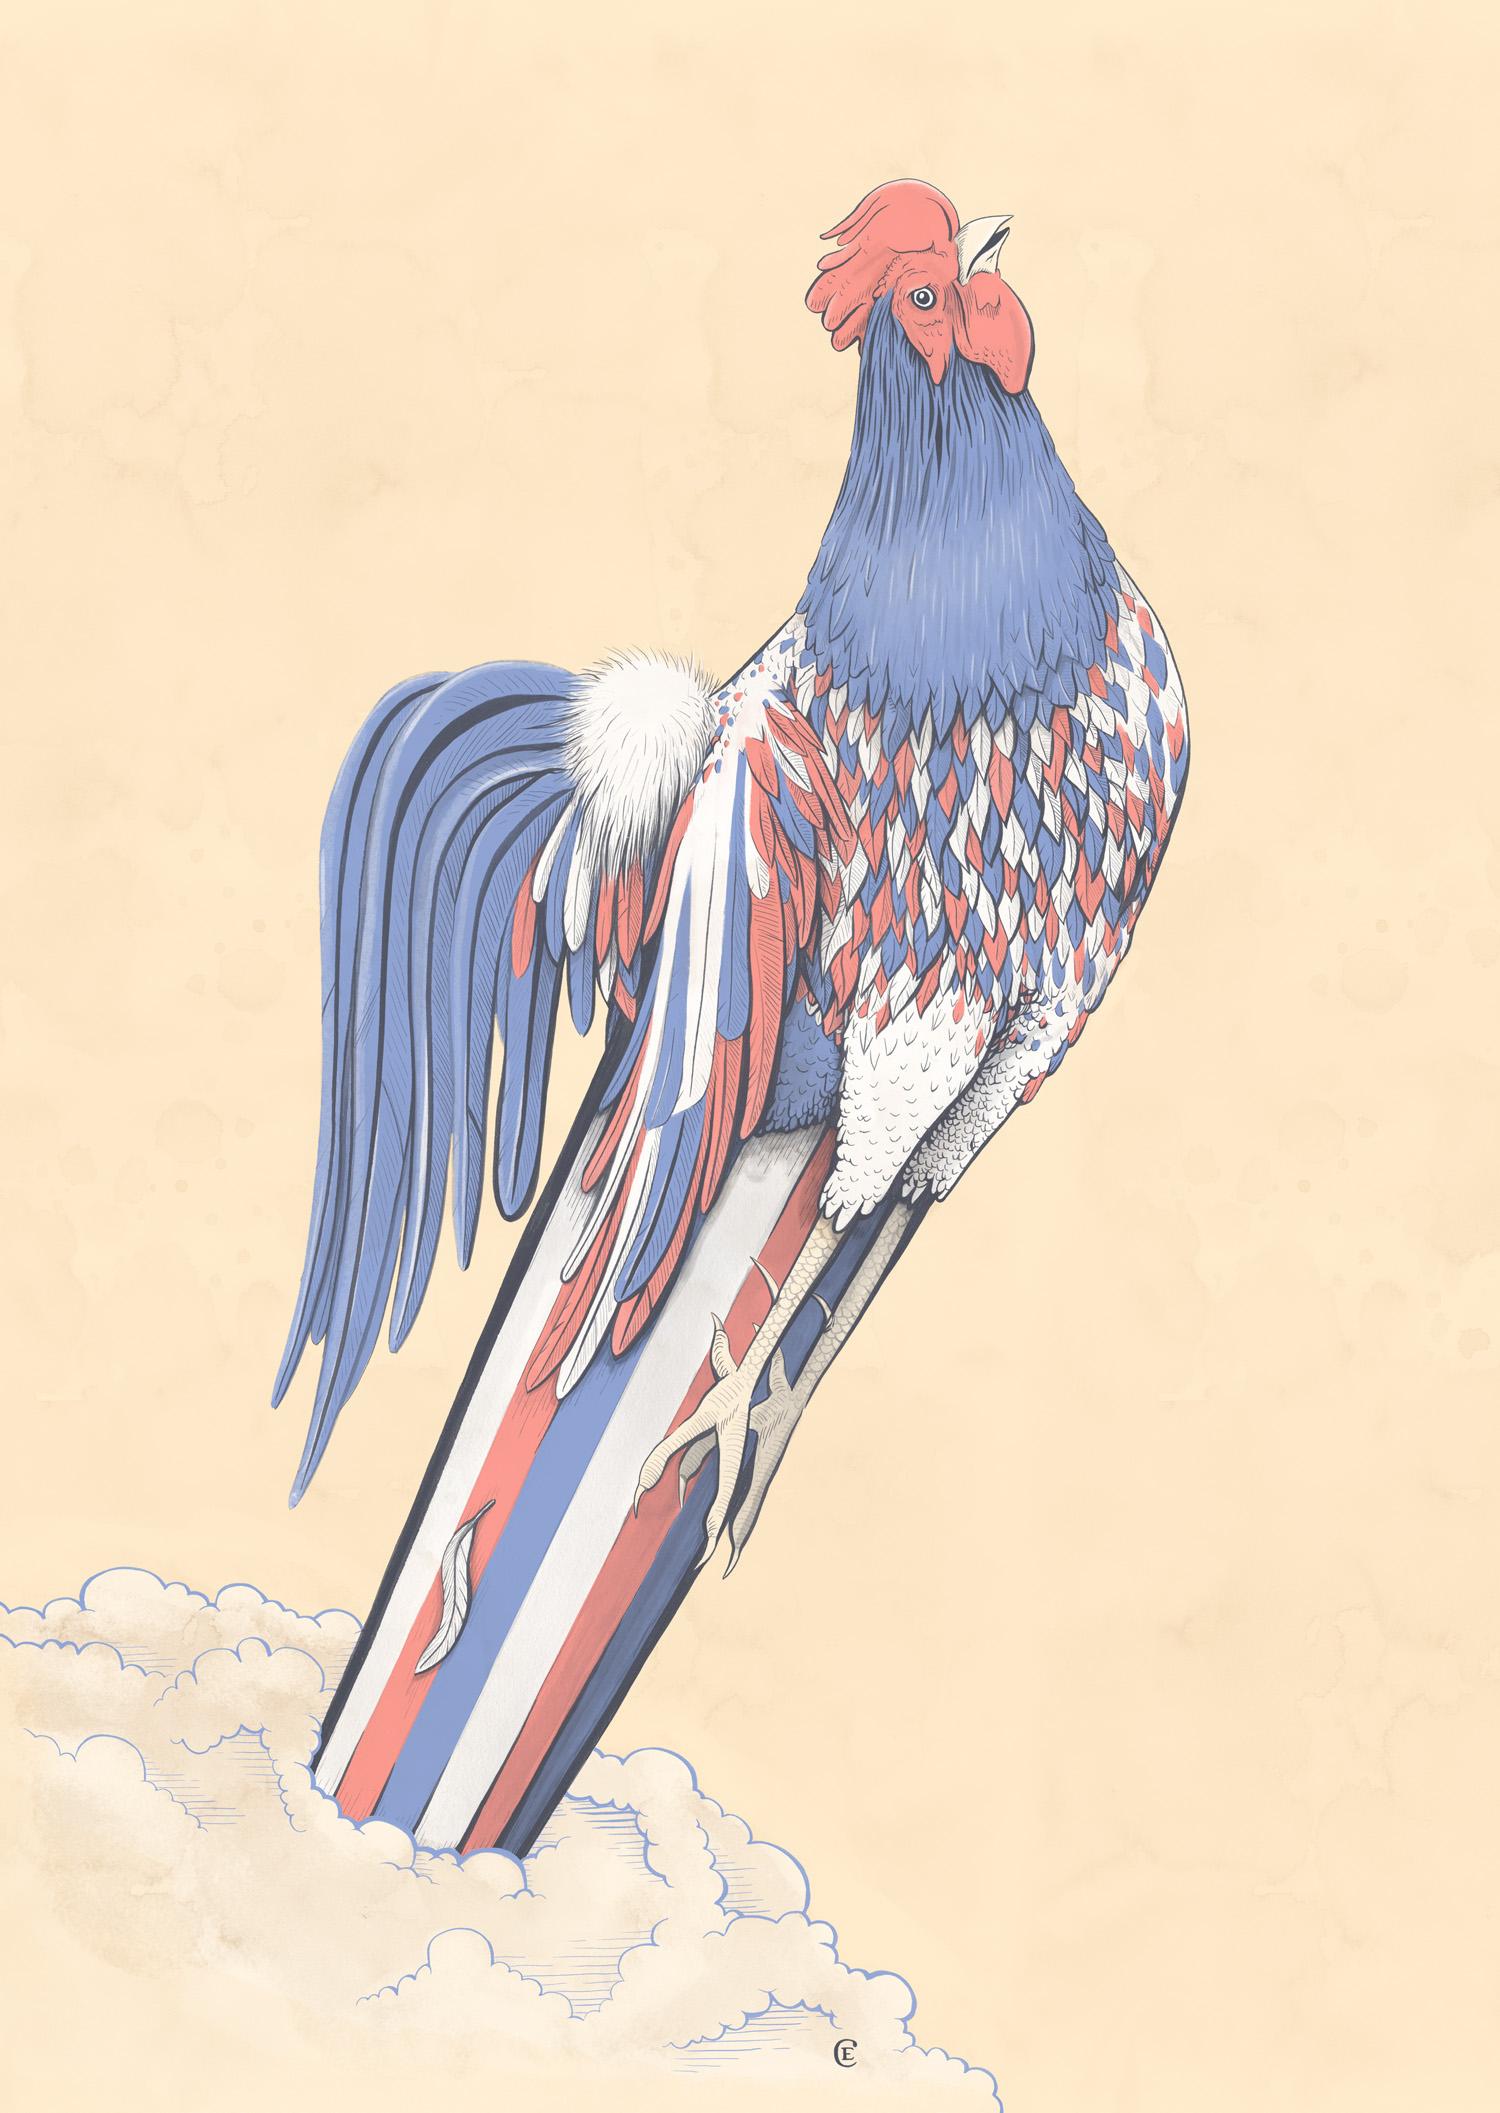 Chris-Edser-Gallic-Rooster-Lofficiel-Hommes.jpg